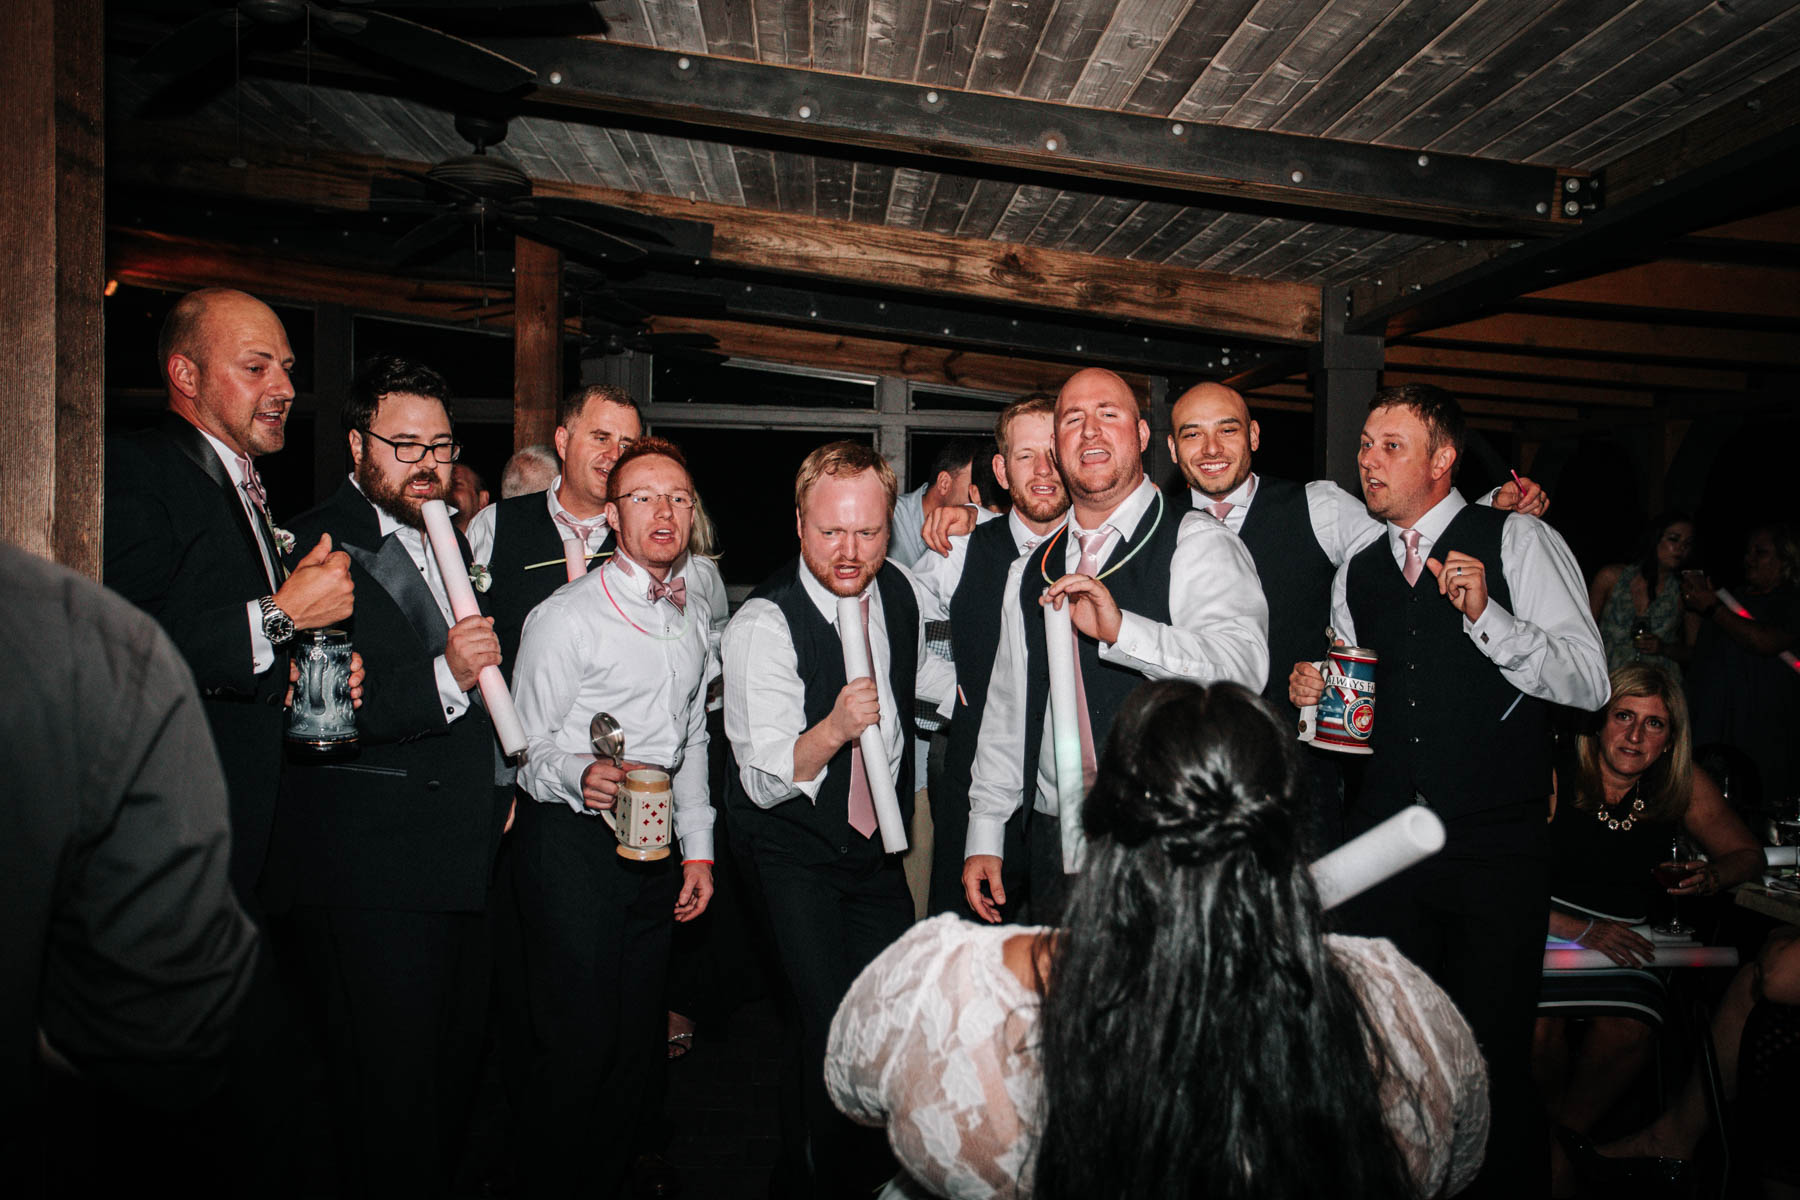 wedding-candid-photography-photos.jpg